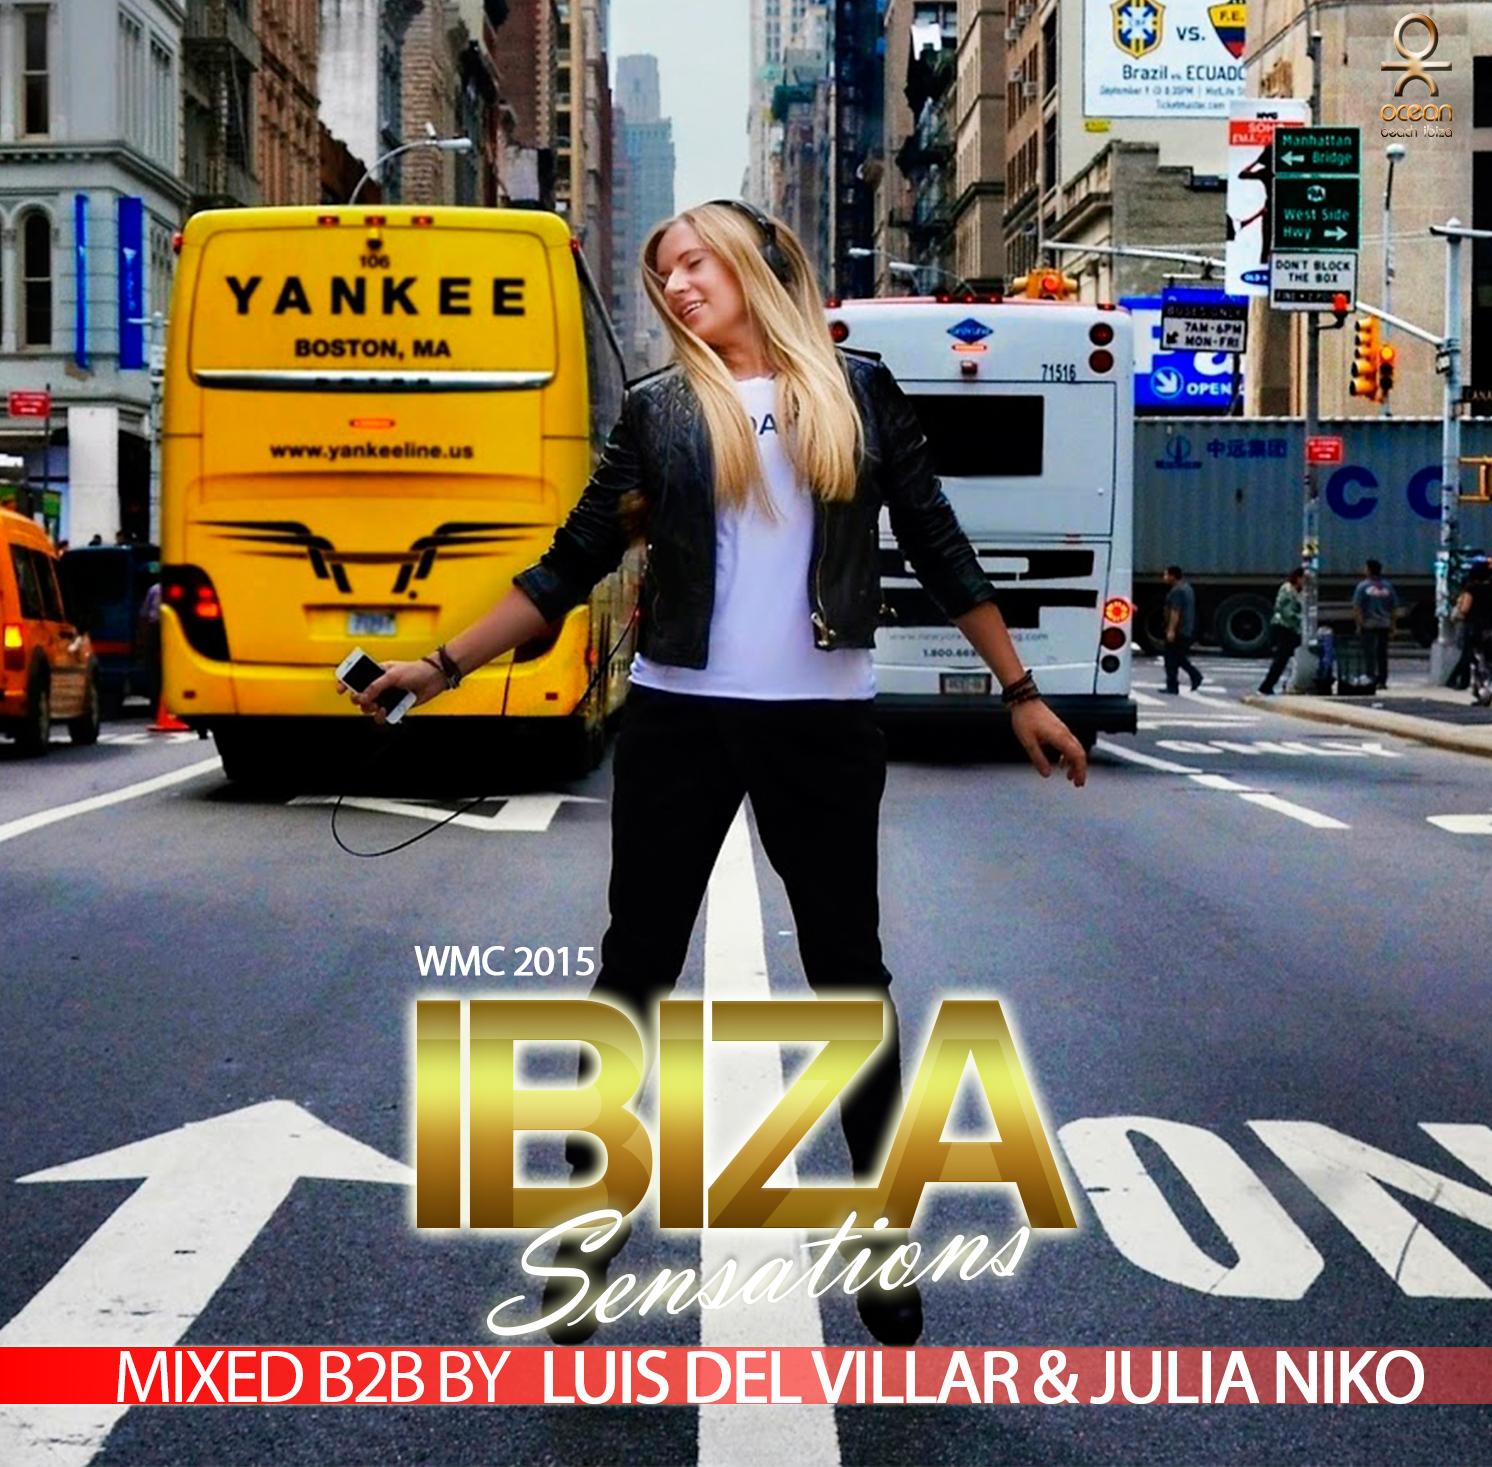 Artwork for Ibiza Sensations 113 WMC 2015 Set b2b with Julia Niko